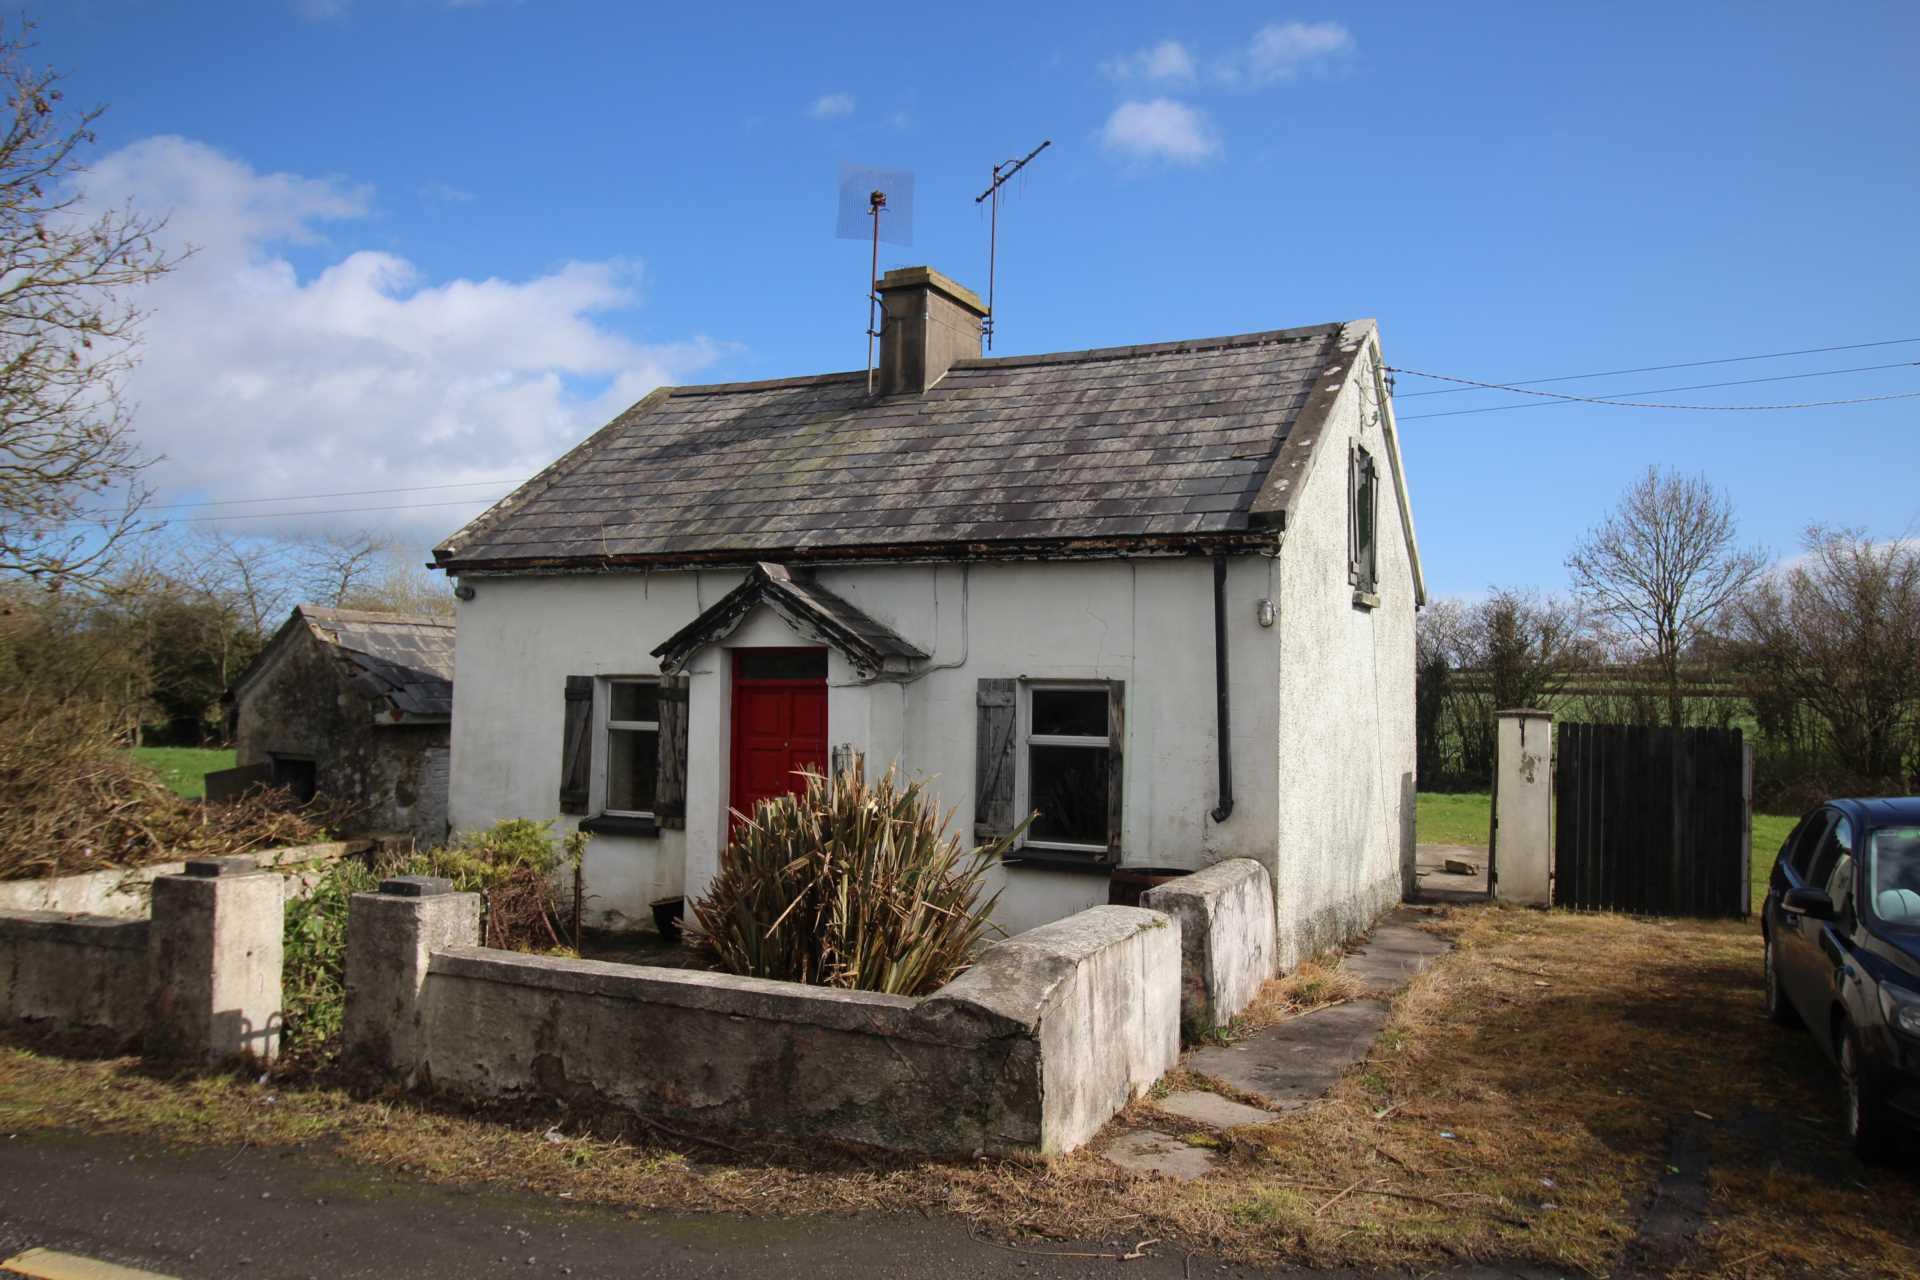 Ballyfookeen, Bruree, Co. Limerick